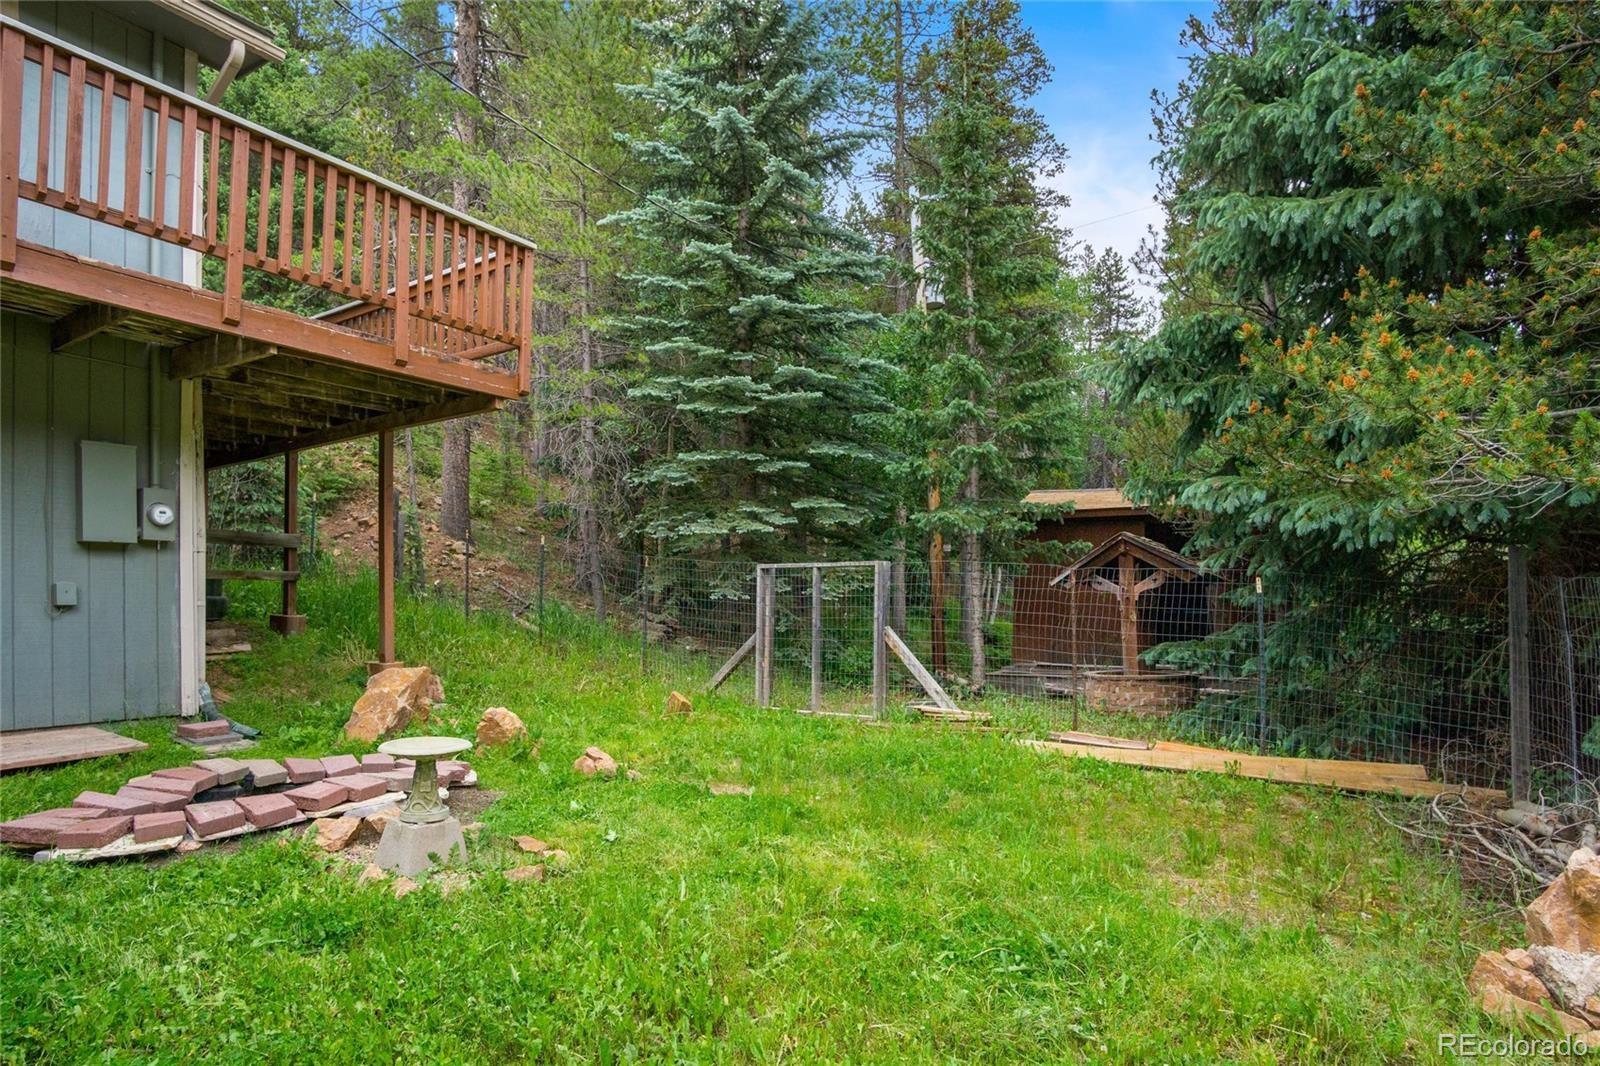 MLS# 5887293 - 15 - 8858 Black Mountain Drive, Conifer, CO 80433